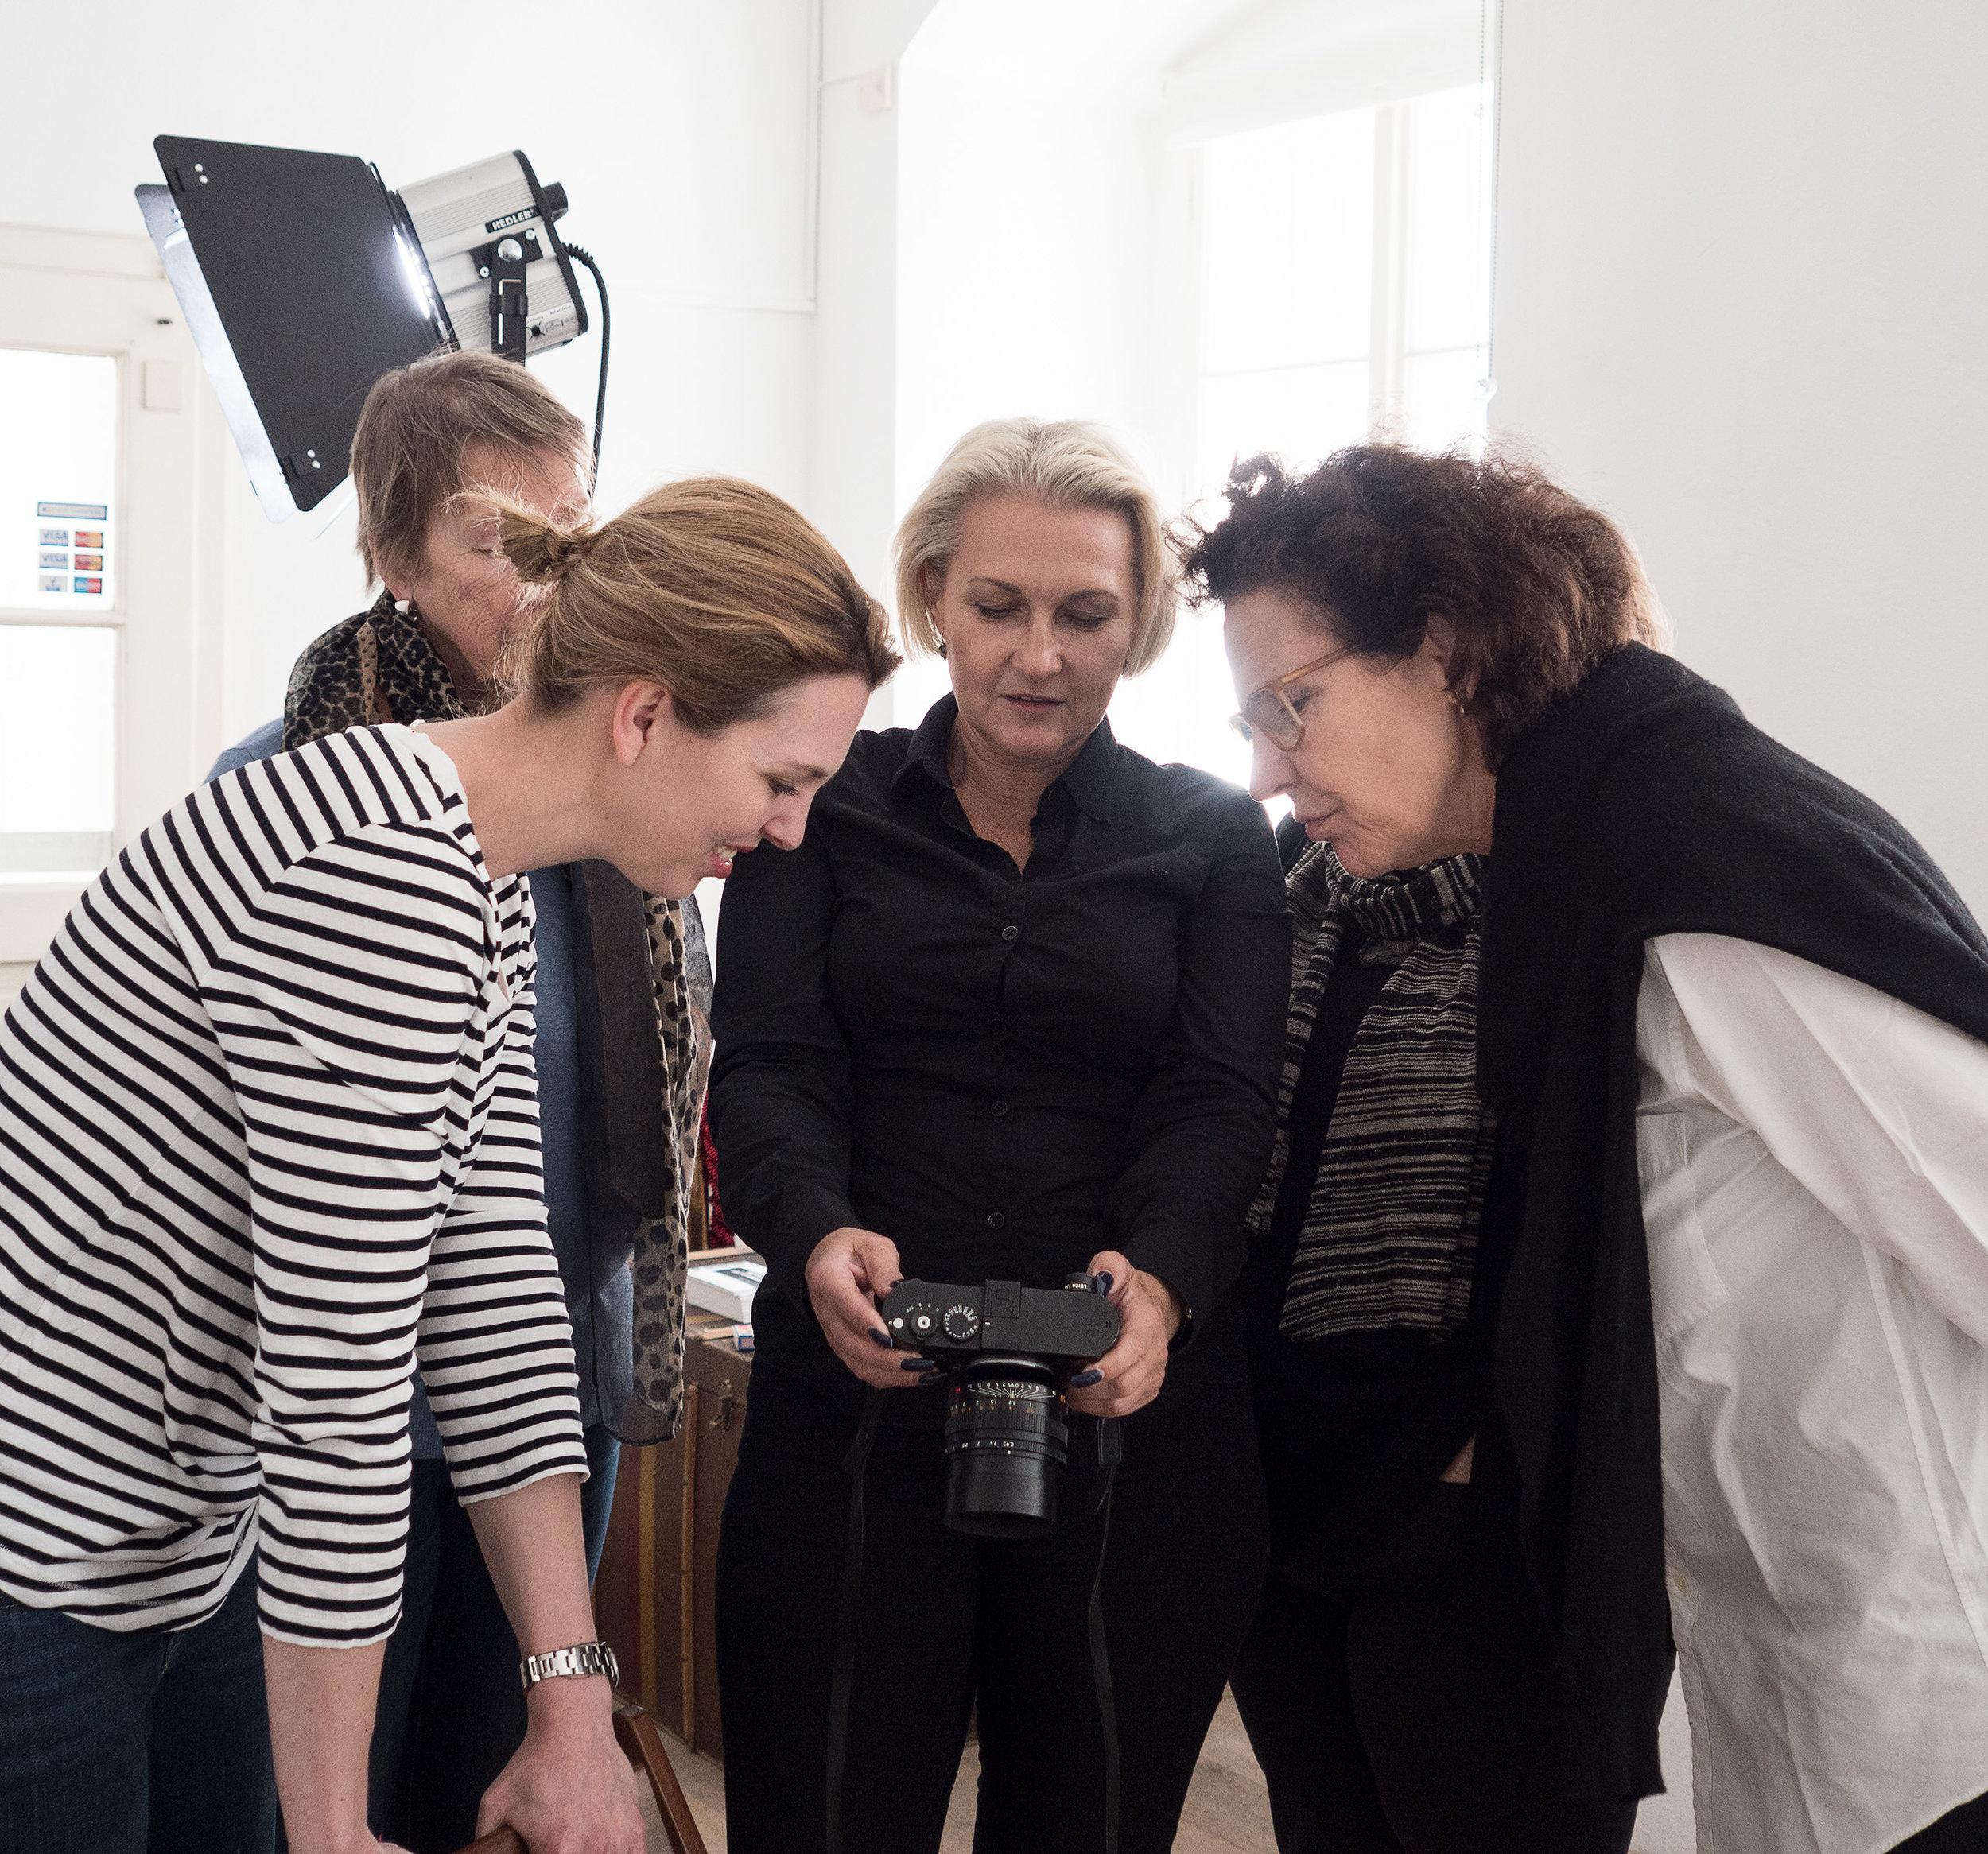 Fotos: Anna Herzig